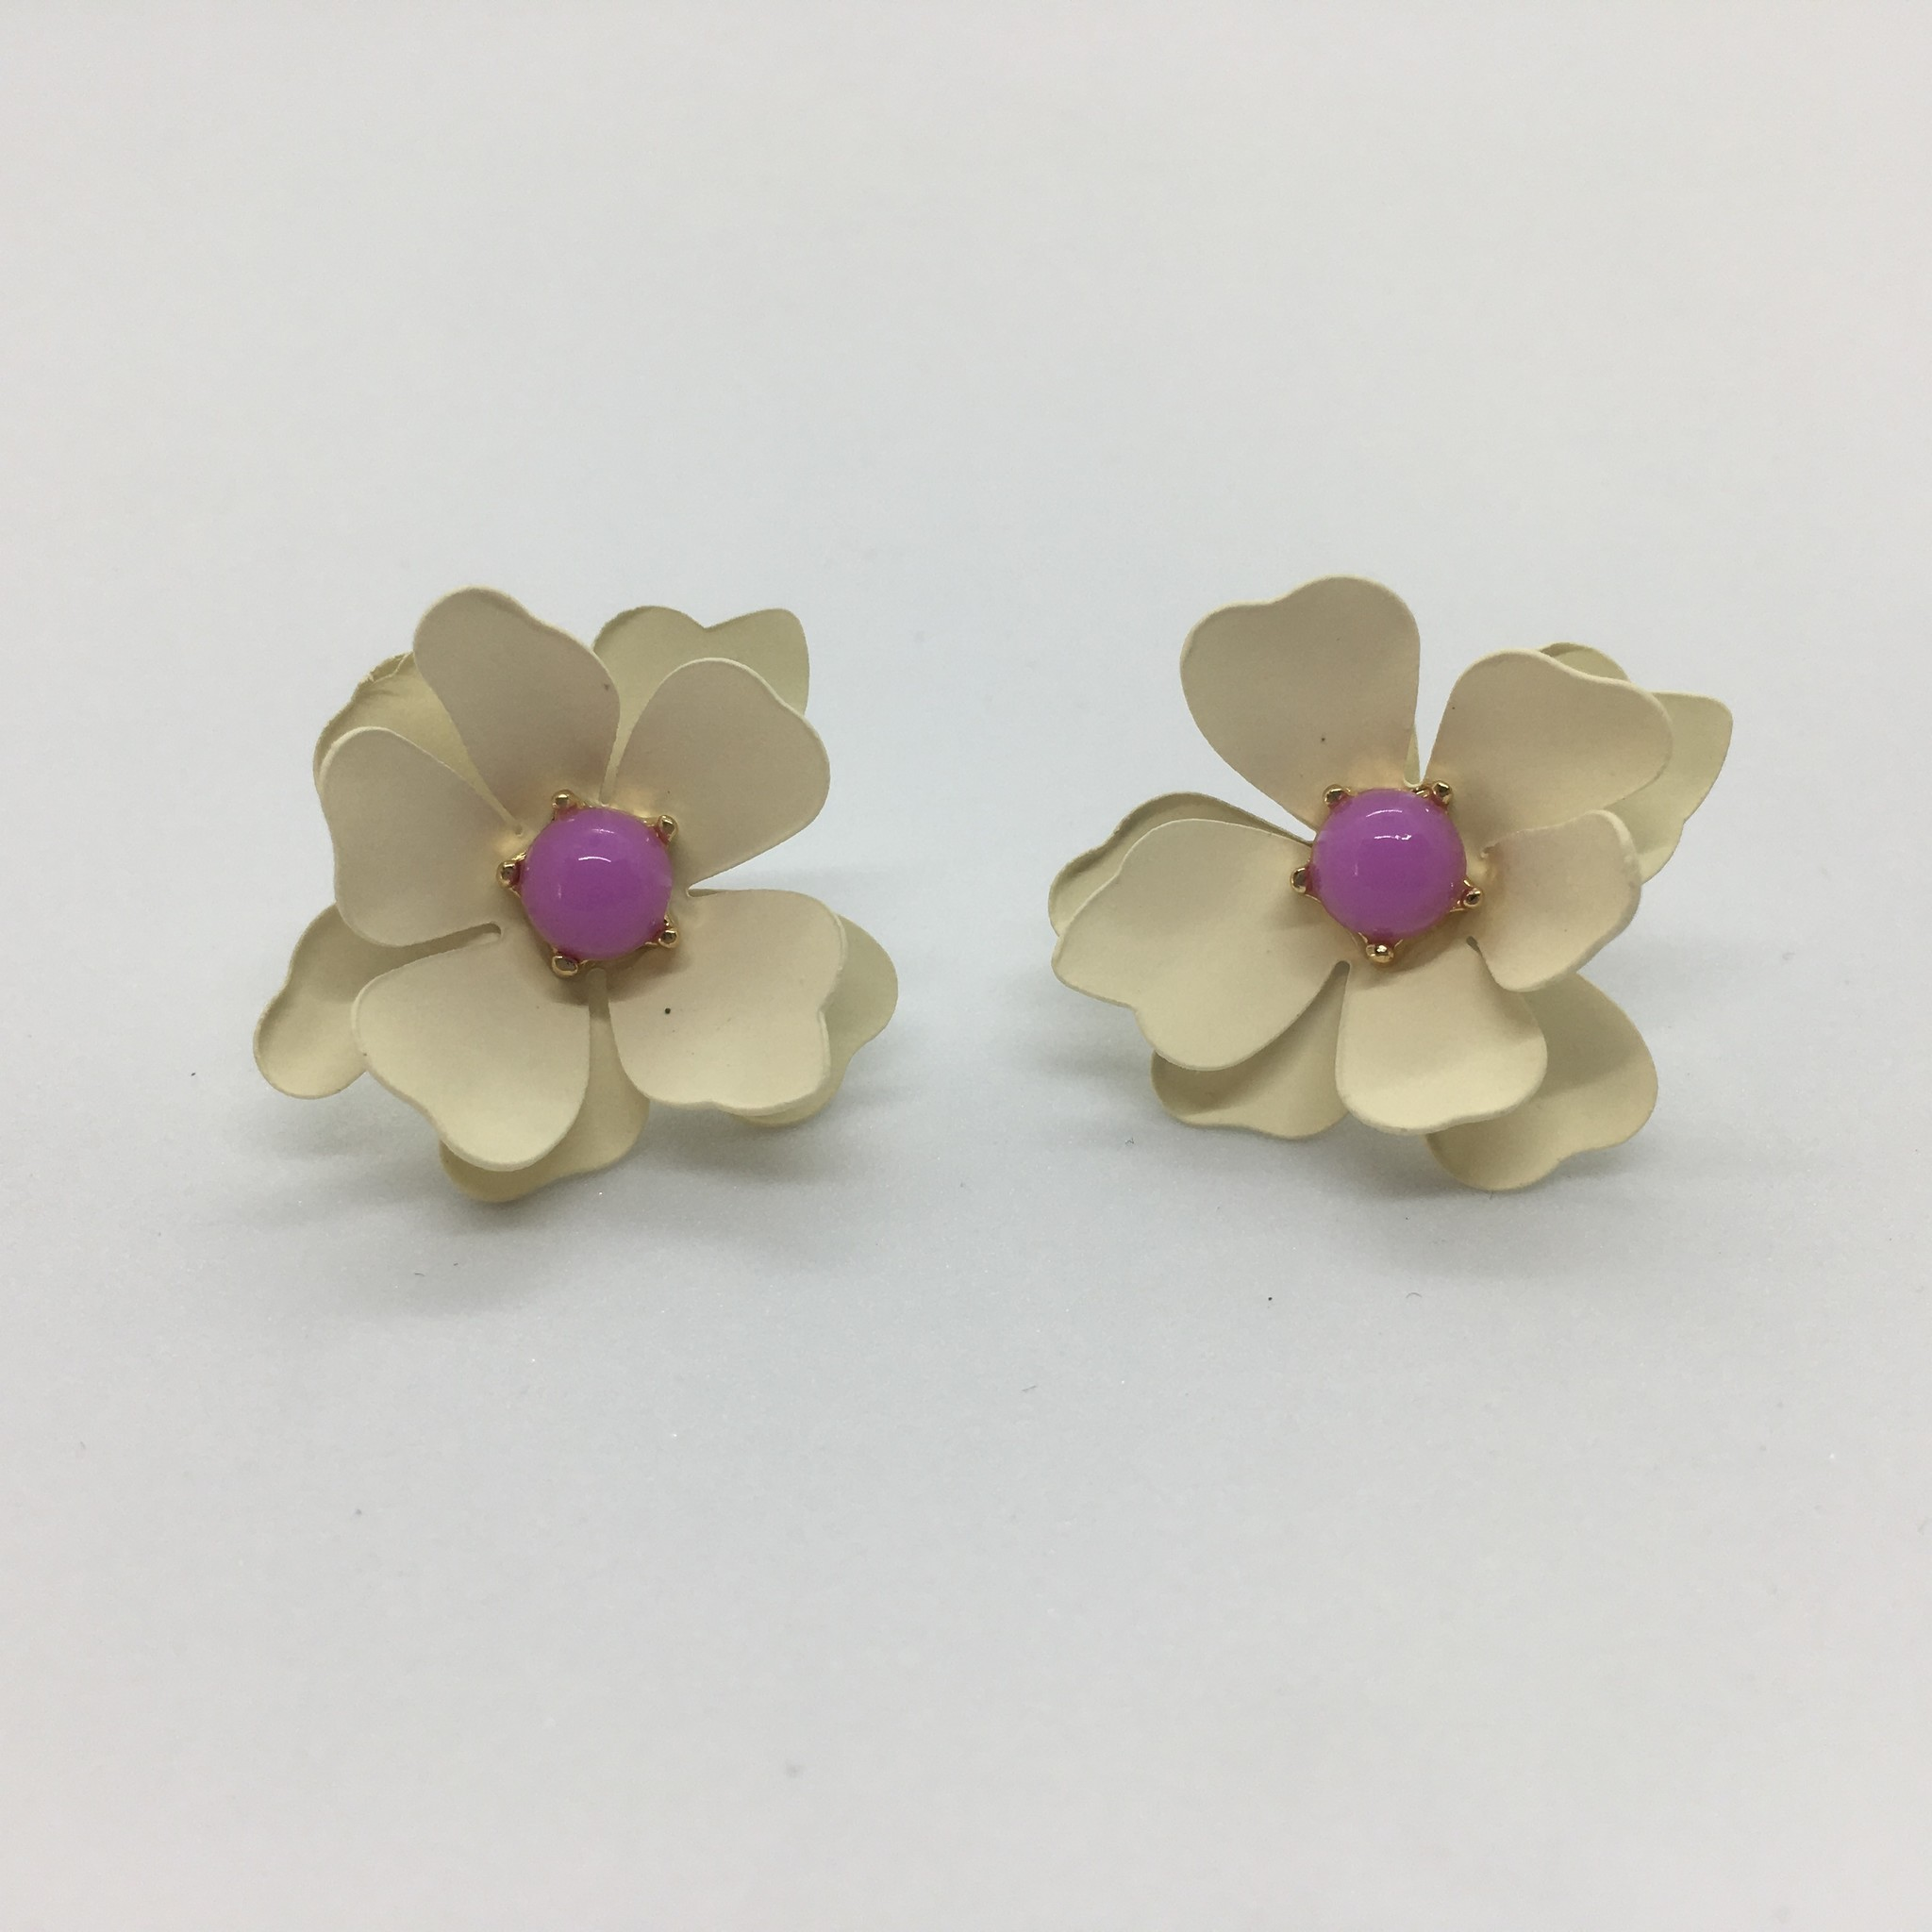 Sooley Designs Anemone Flower Earrings